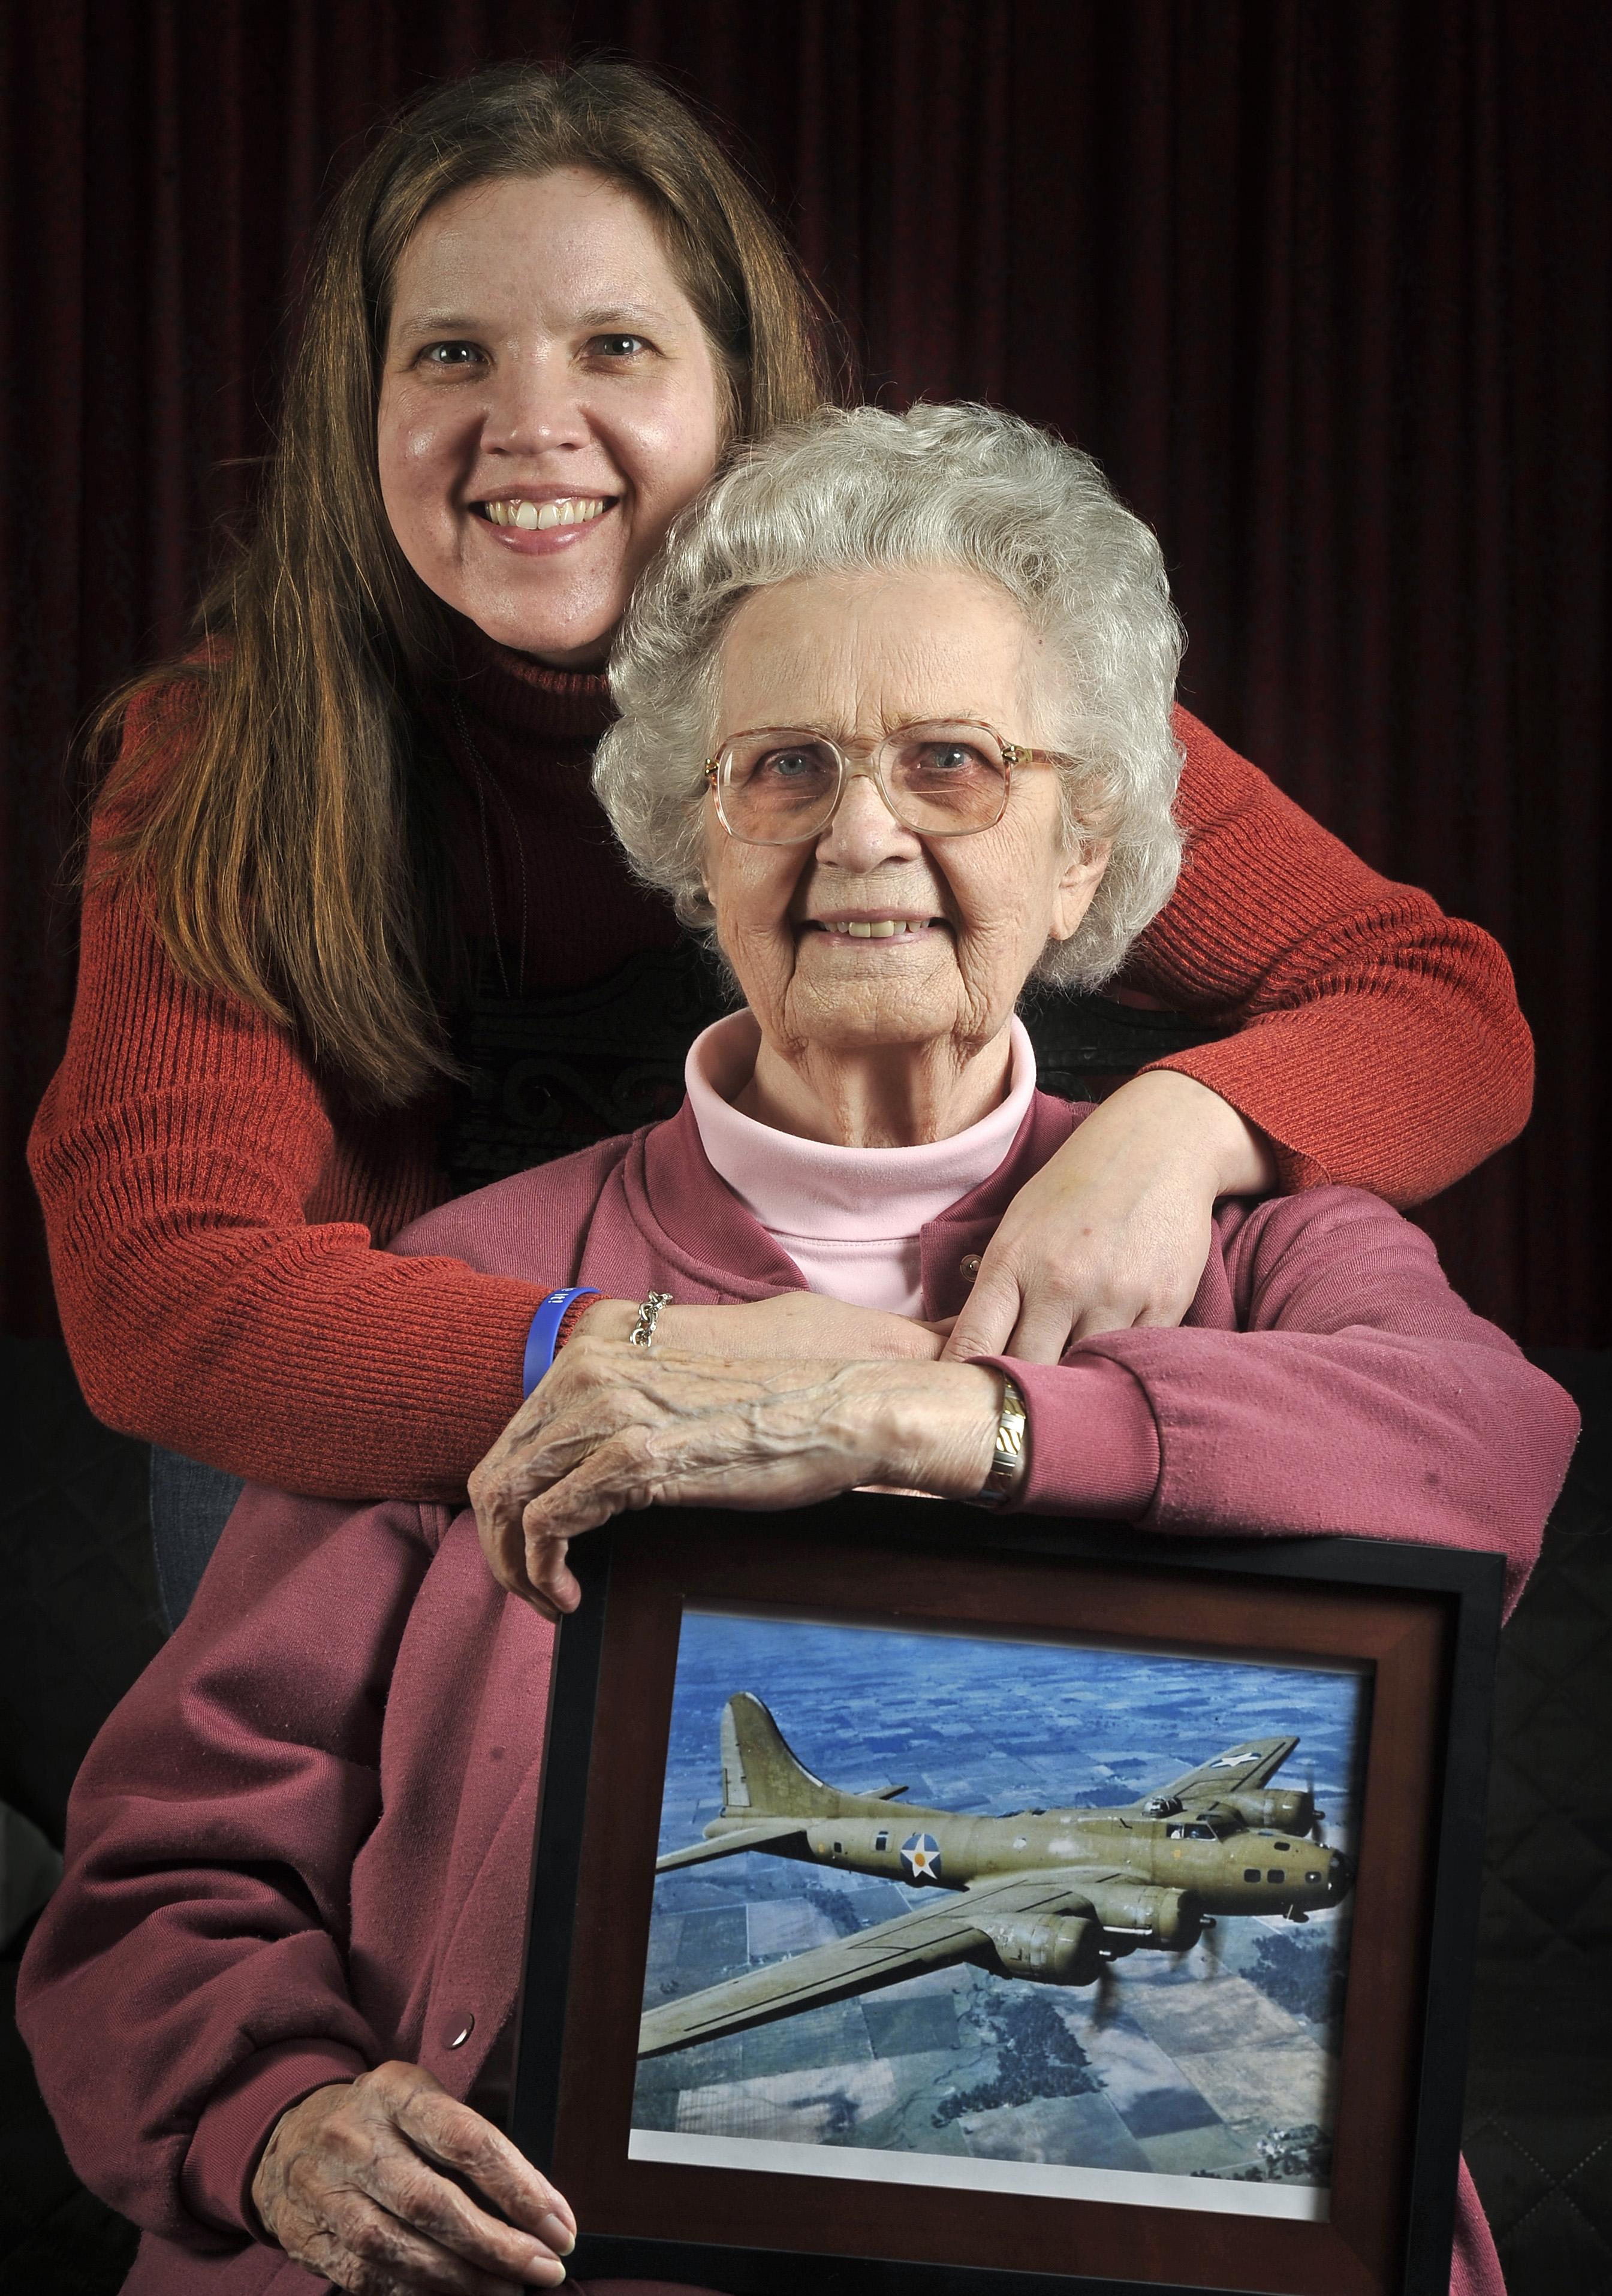 Rosie The Riveter Grandma Inspires Nasa Granddaughter Newswest9 Com